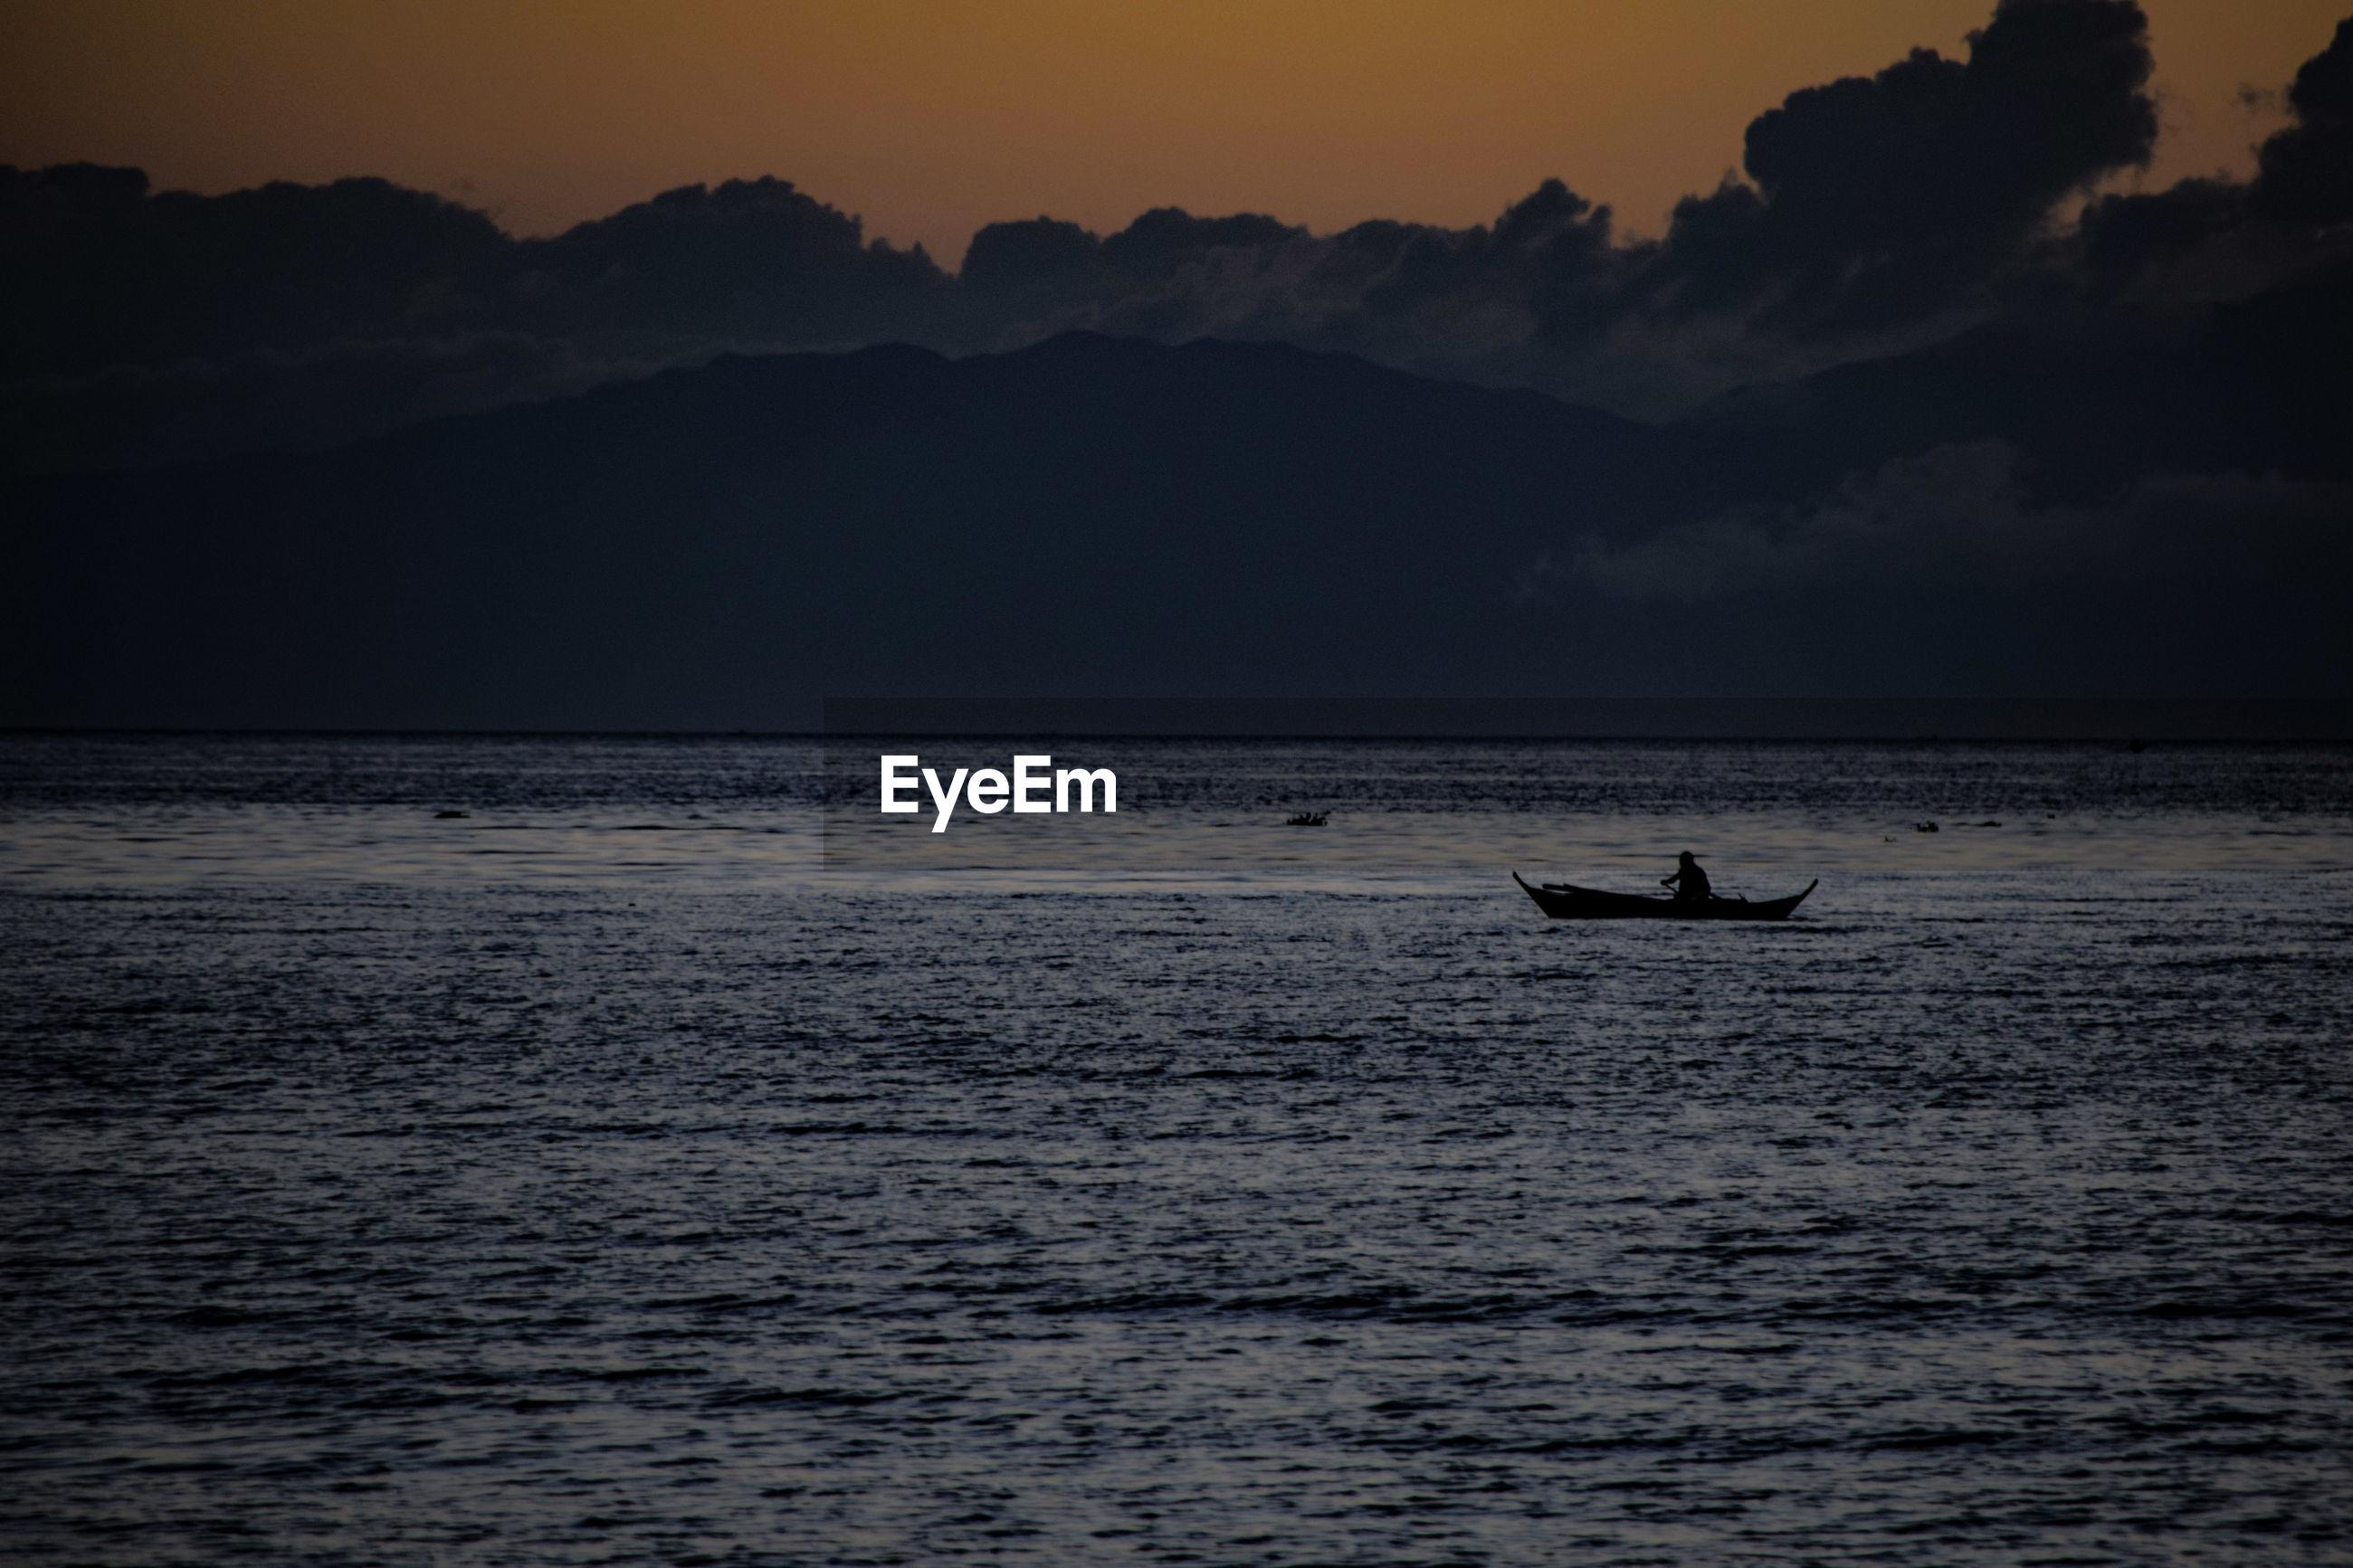 Silhouette on sea against sunset sky